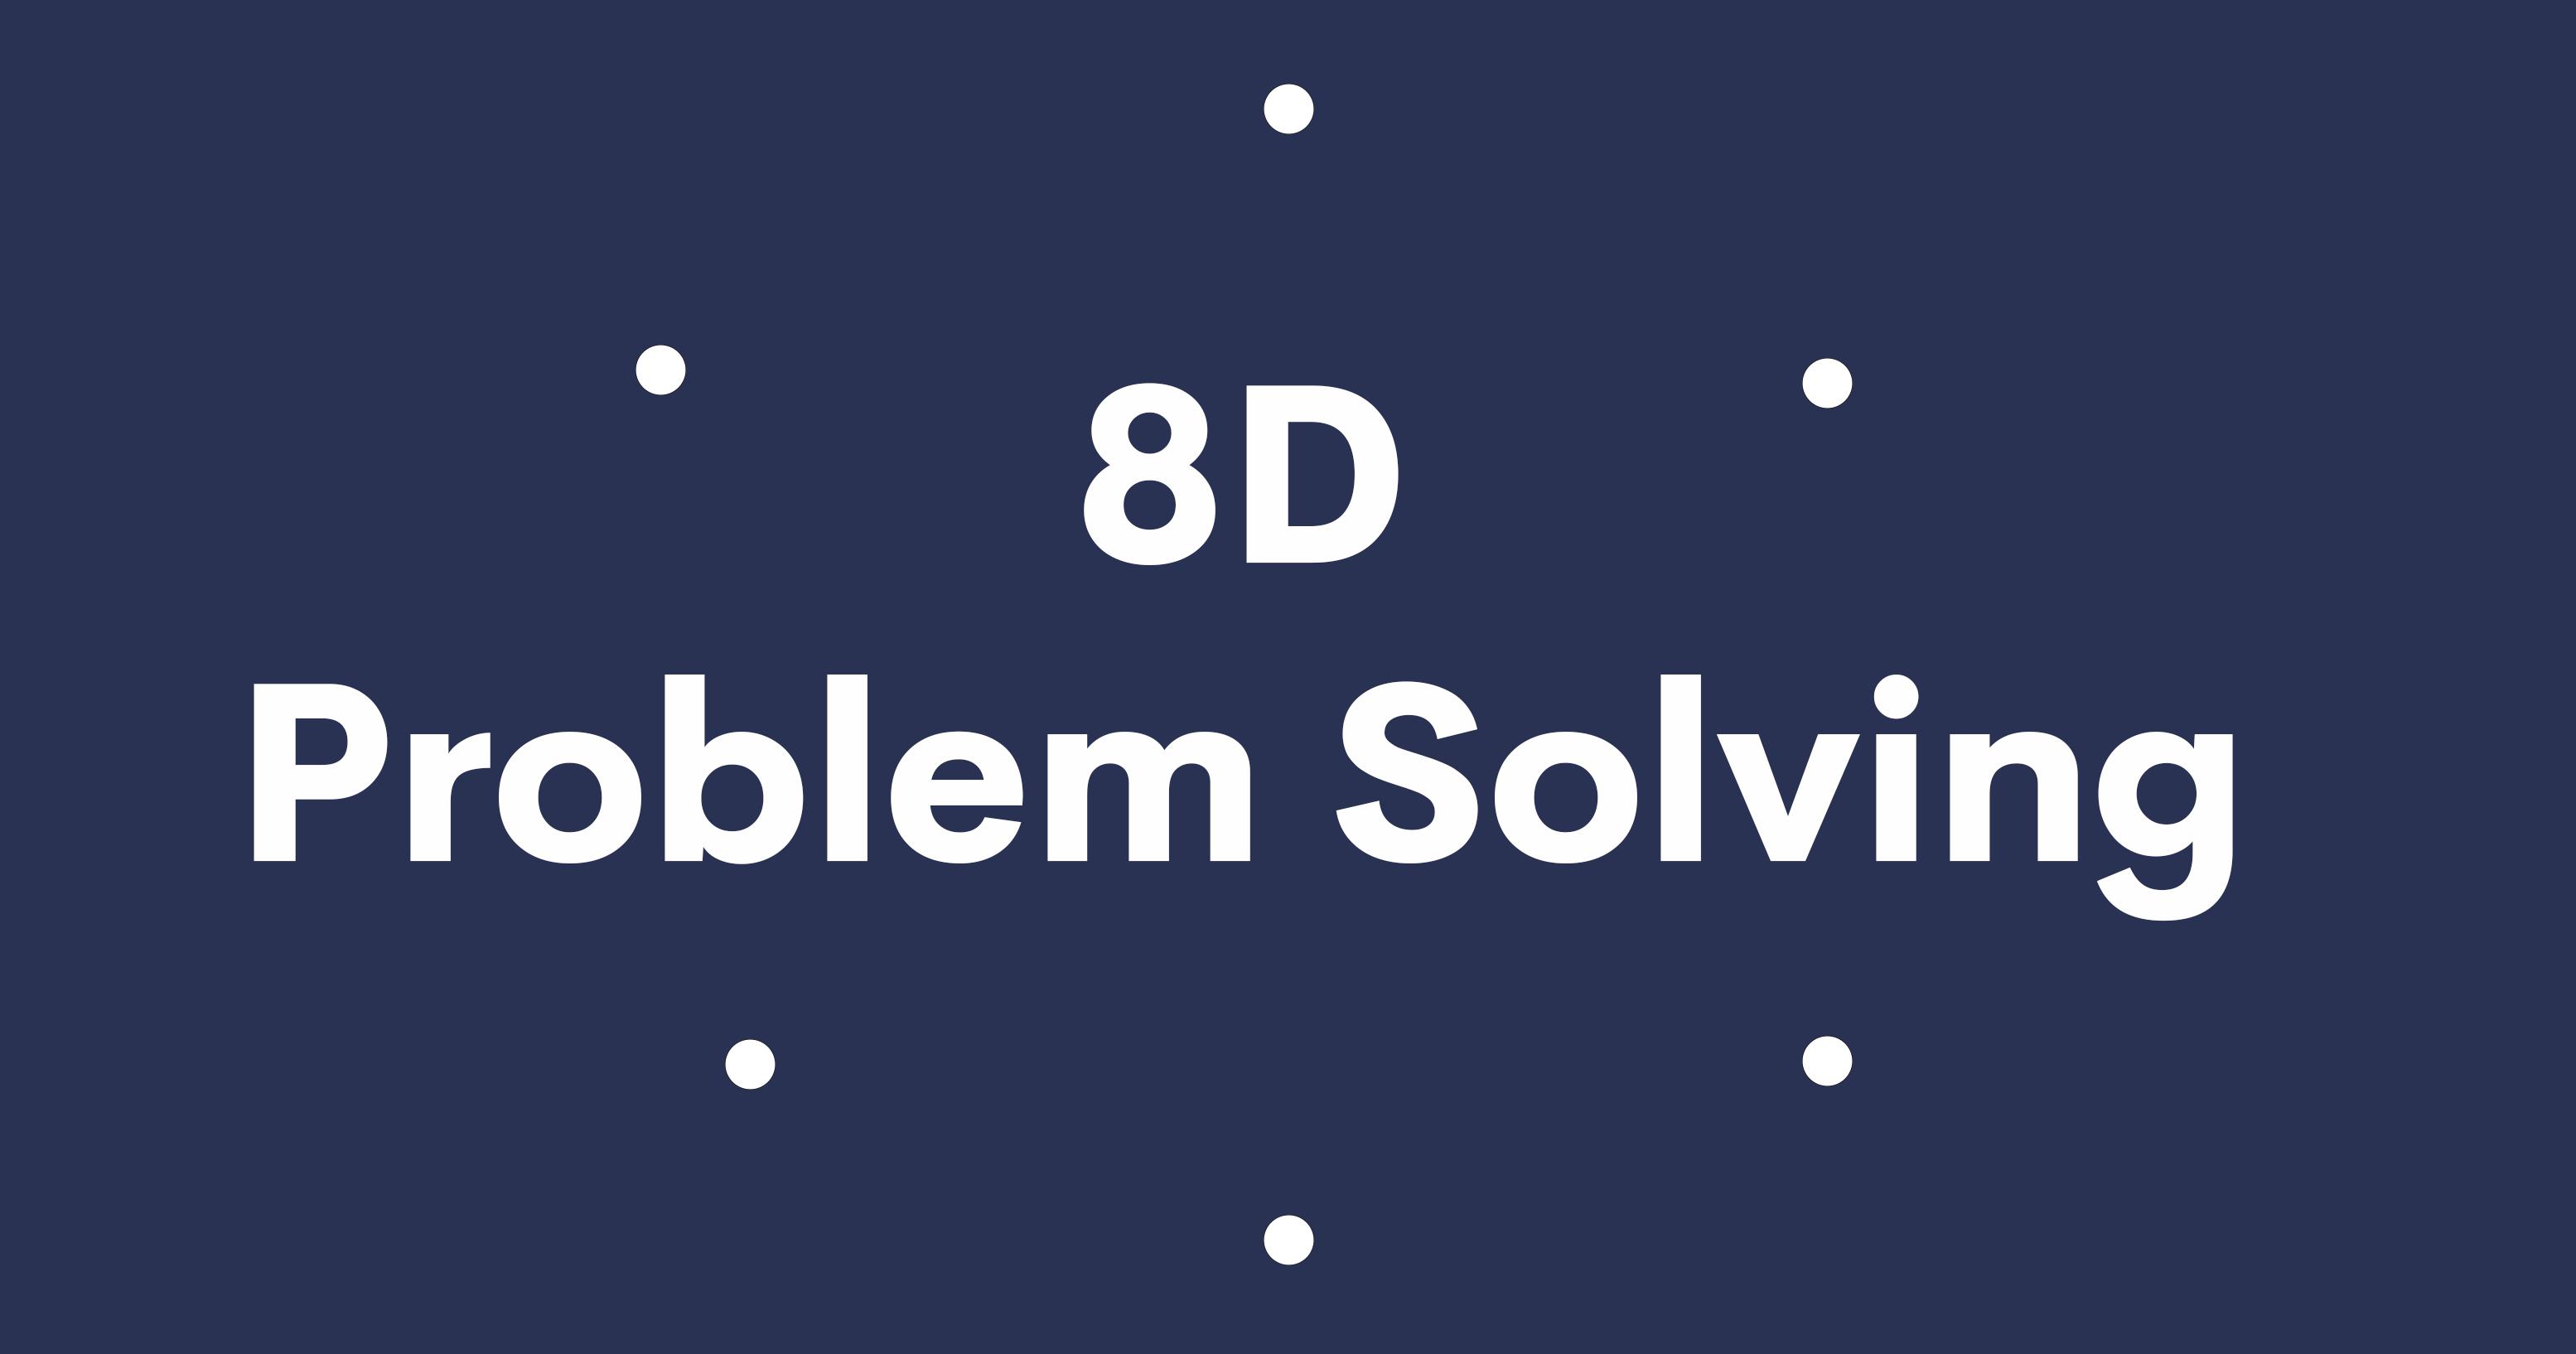 Leveraging the 8 Disciplines in 8D Problem Solving